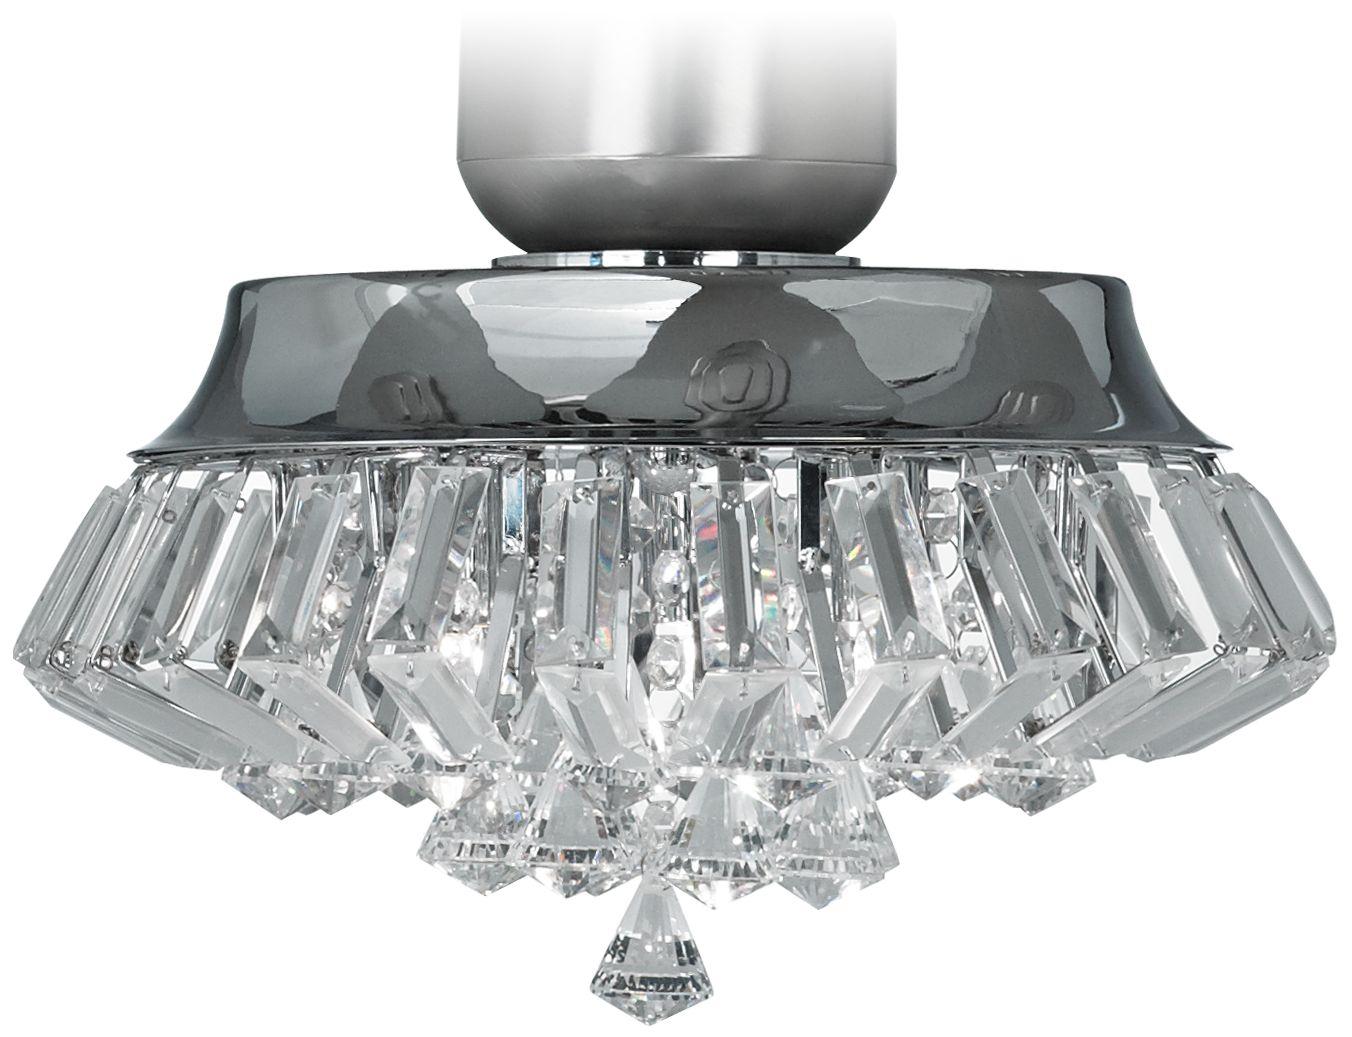 Deco Crystal Chrome Universal Ceiling Fan Light Kit   #V5824   Lamps Plus